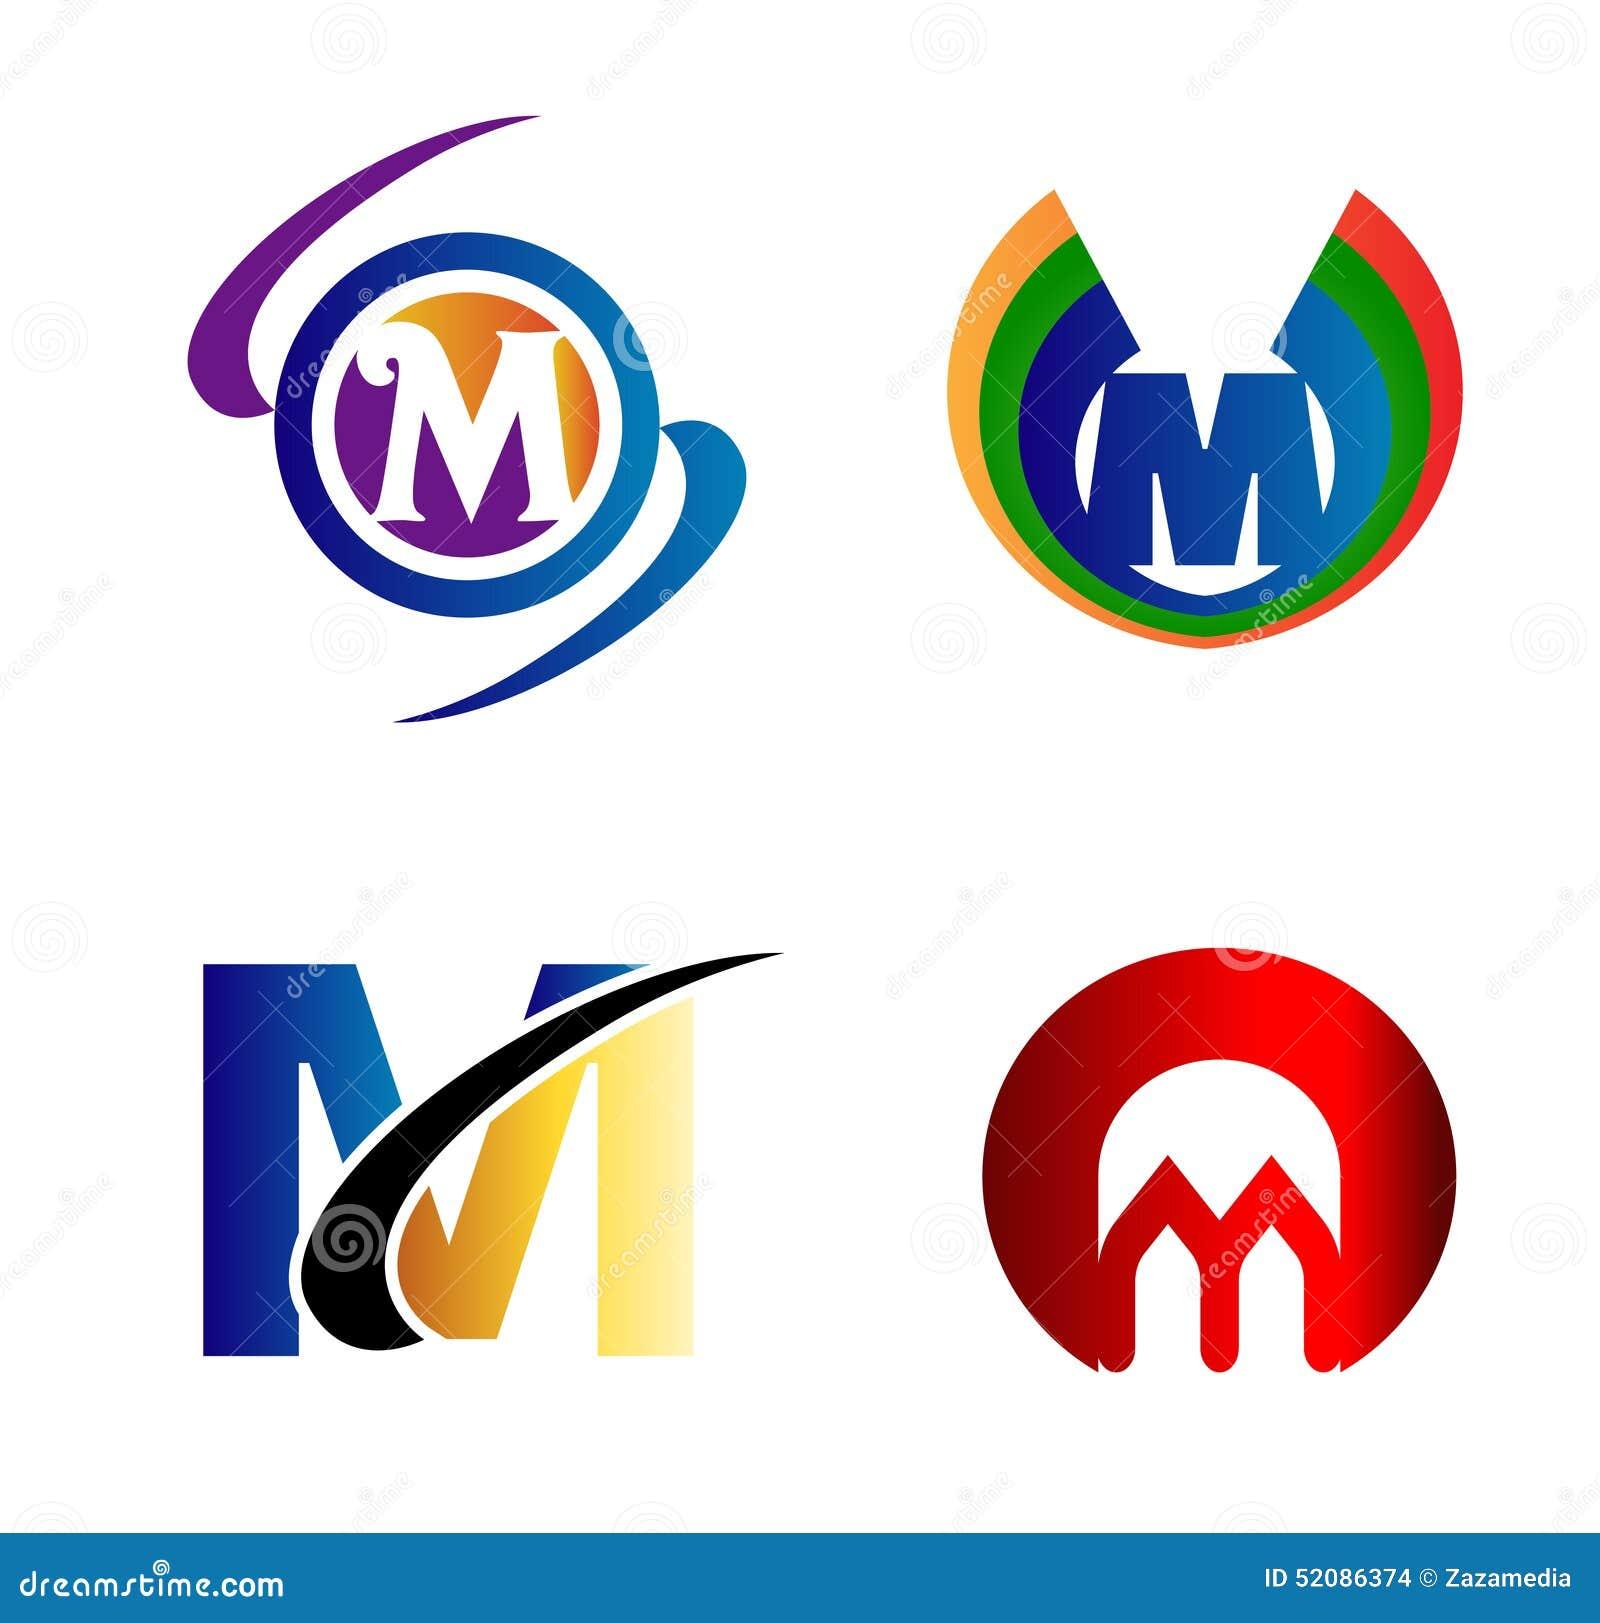 Graphic Design Art Letters C